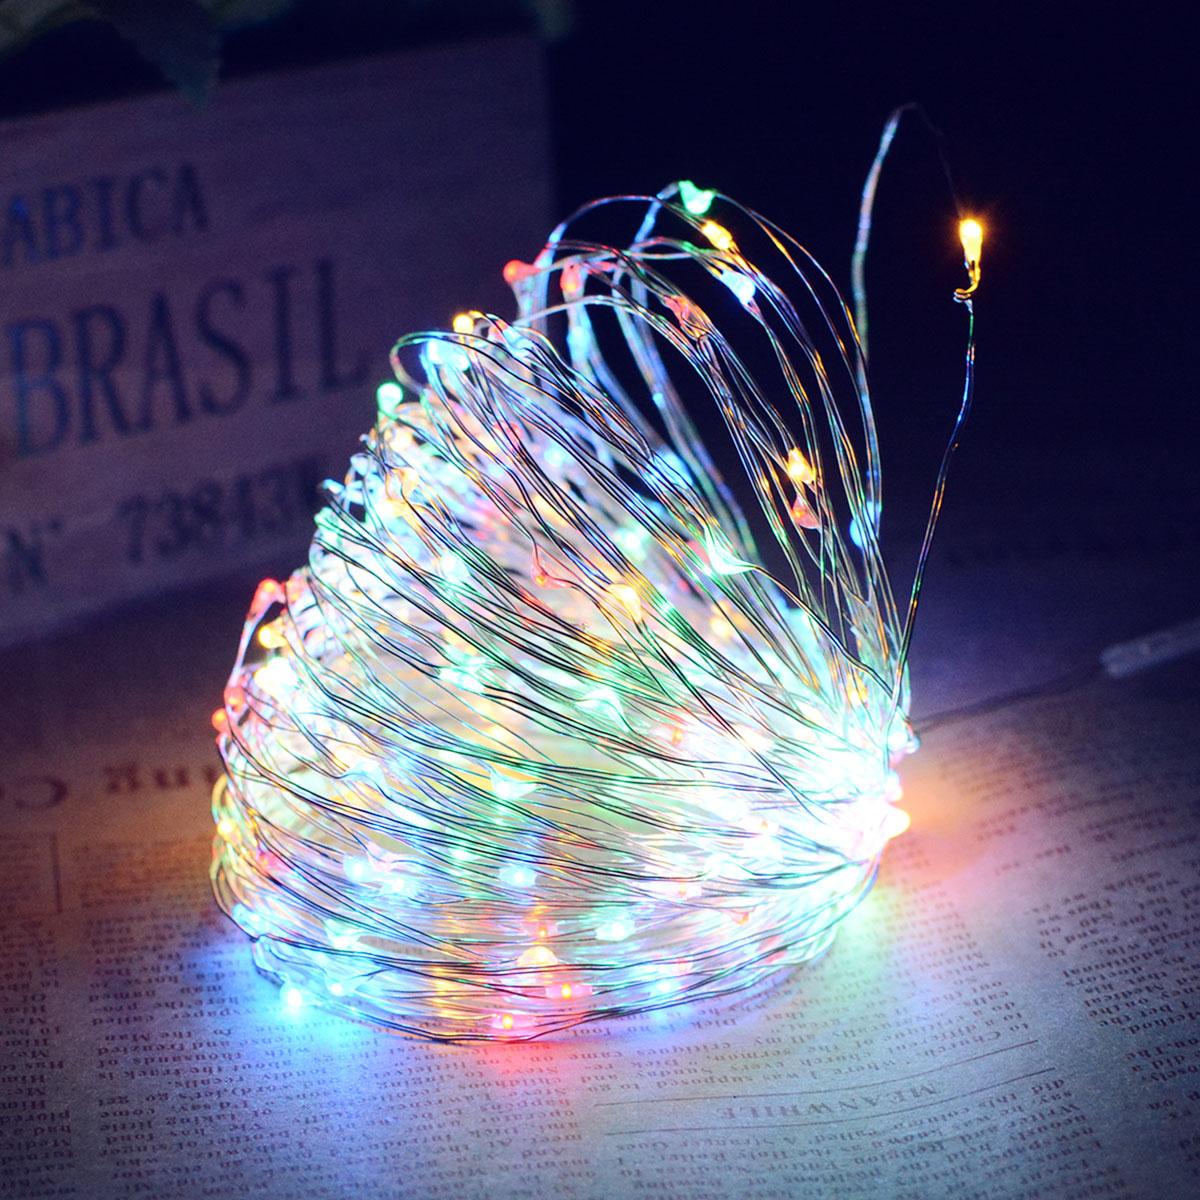 10M/20M 100LEDs/200LEDs Romanstic Solar Powered Copper Wire String Light Color light_20 meters 200 LED_(ME0004103)